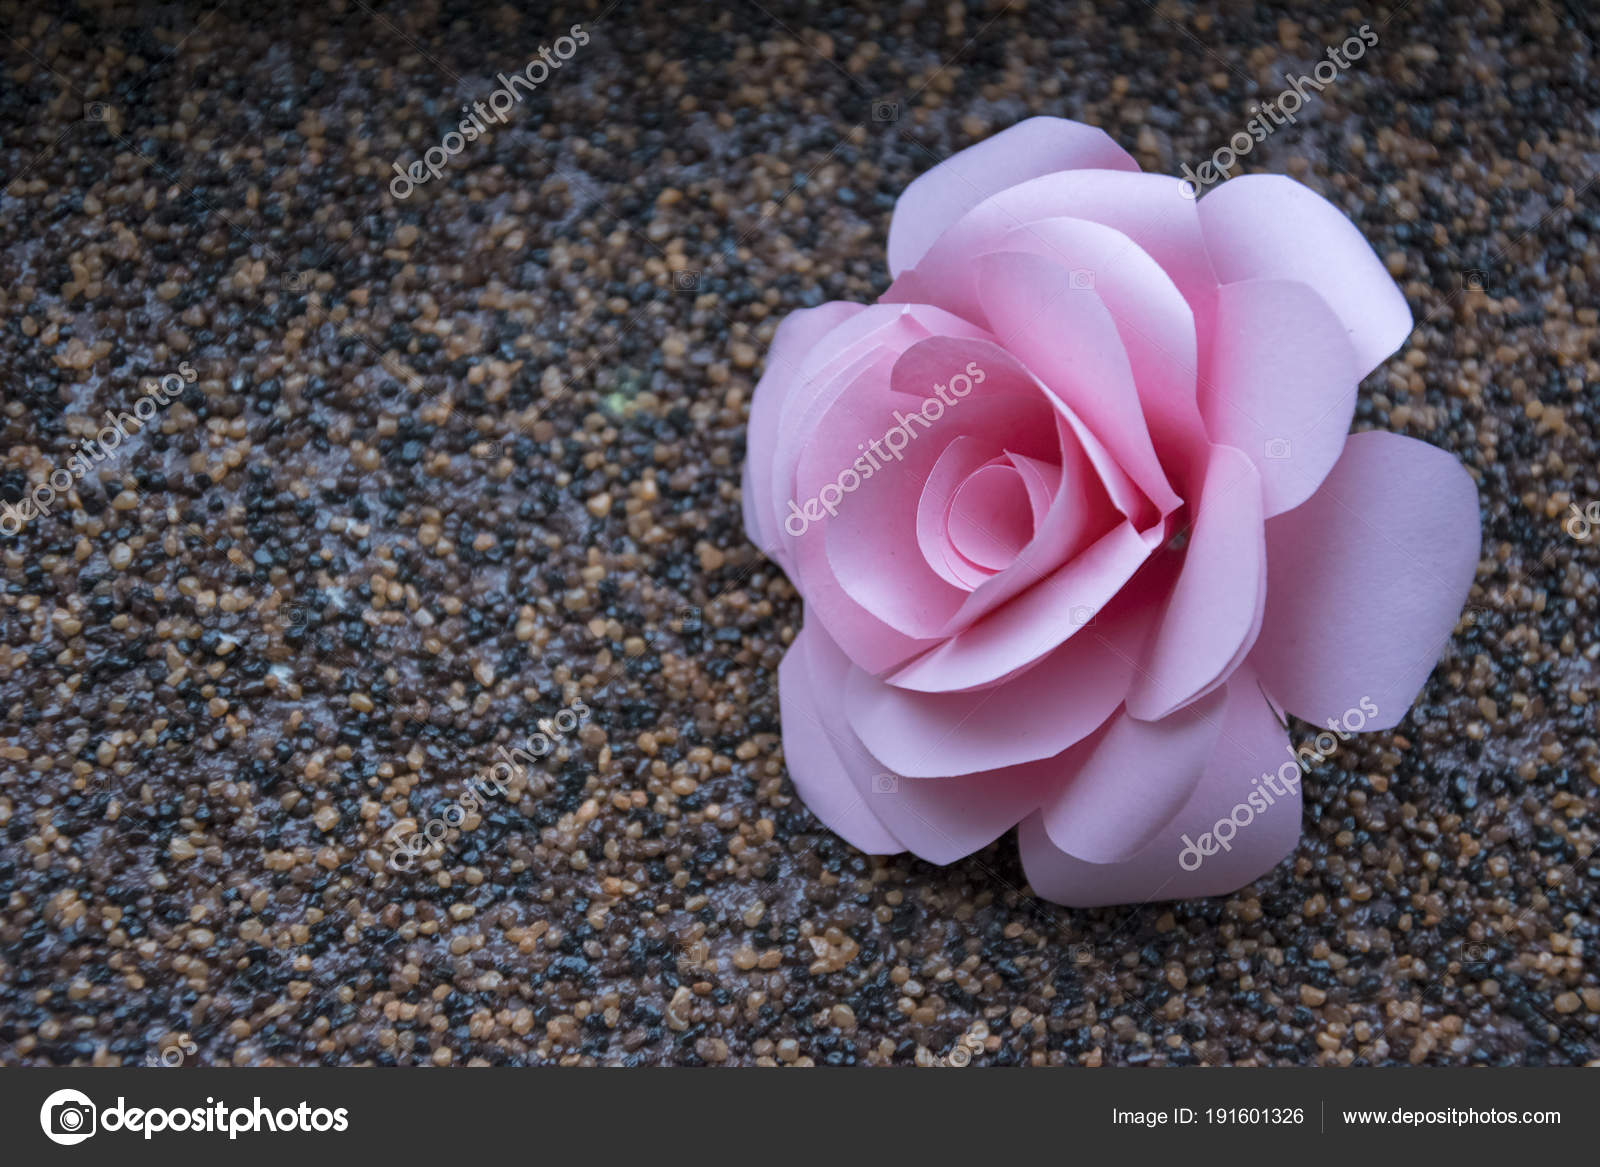 Pastel Paper Rose Wallpaper Wedding Or Valentine Day